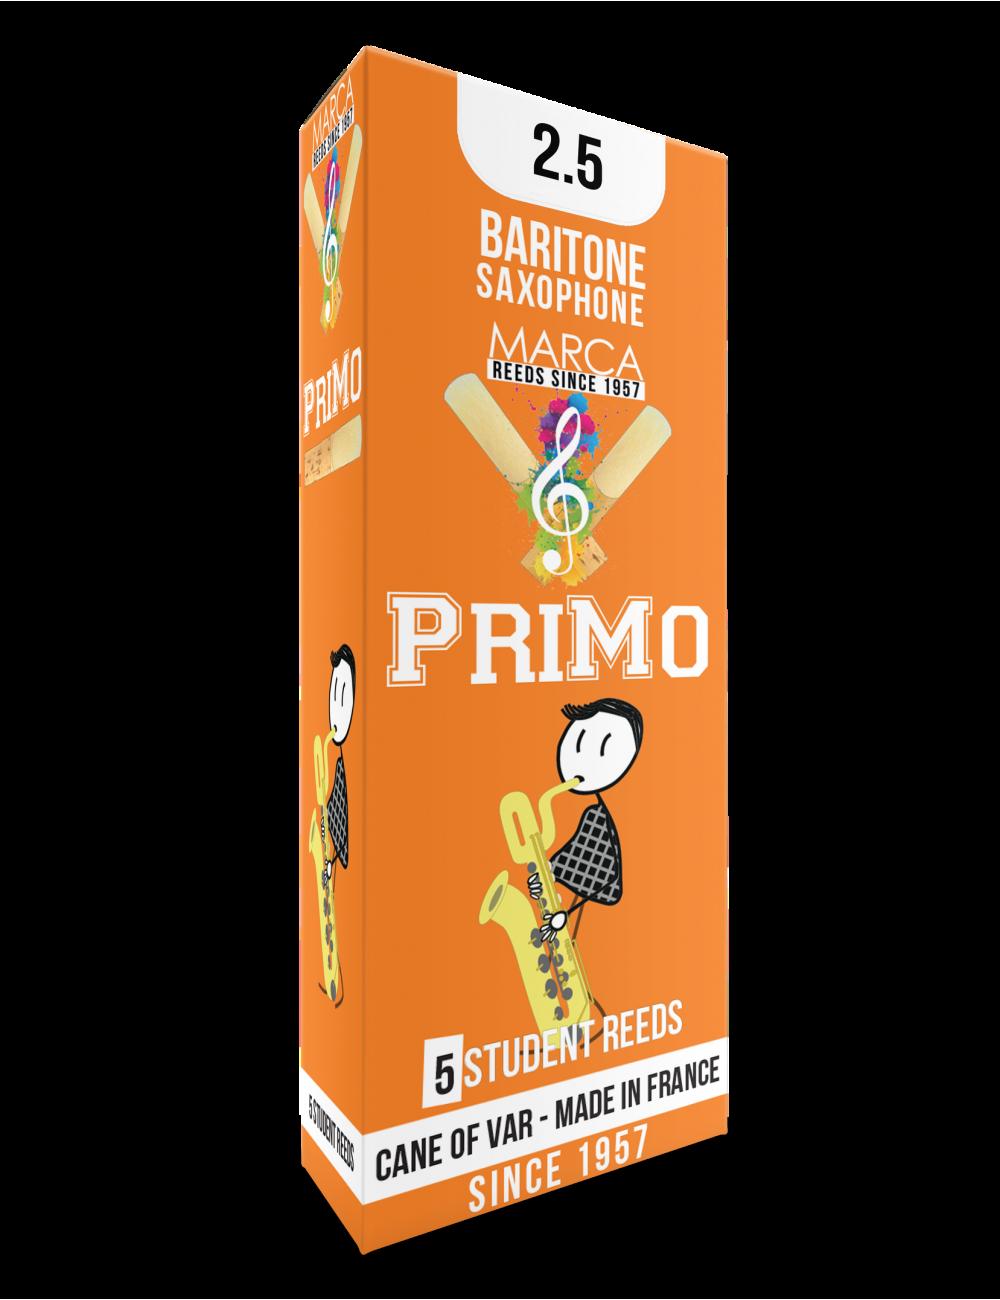 10 REEDS MARCA PriMo BARITONE SAXOPHONE 2.5